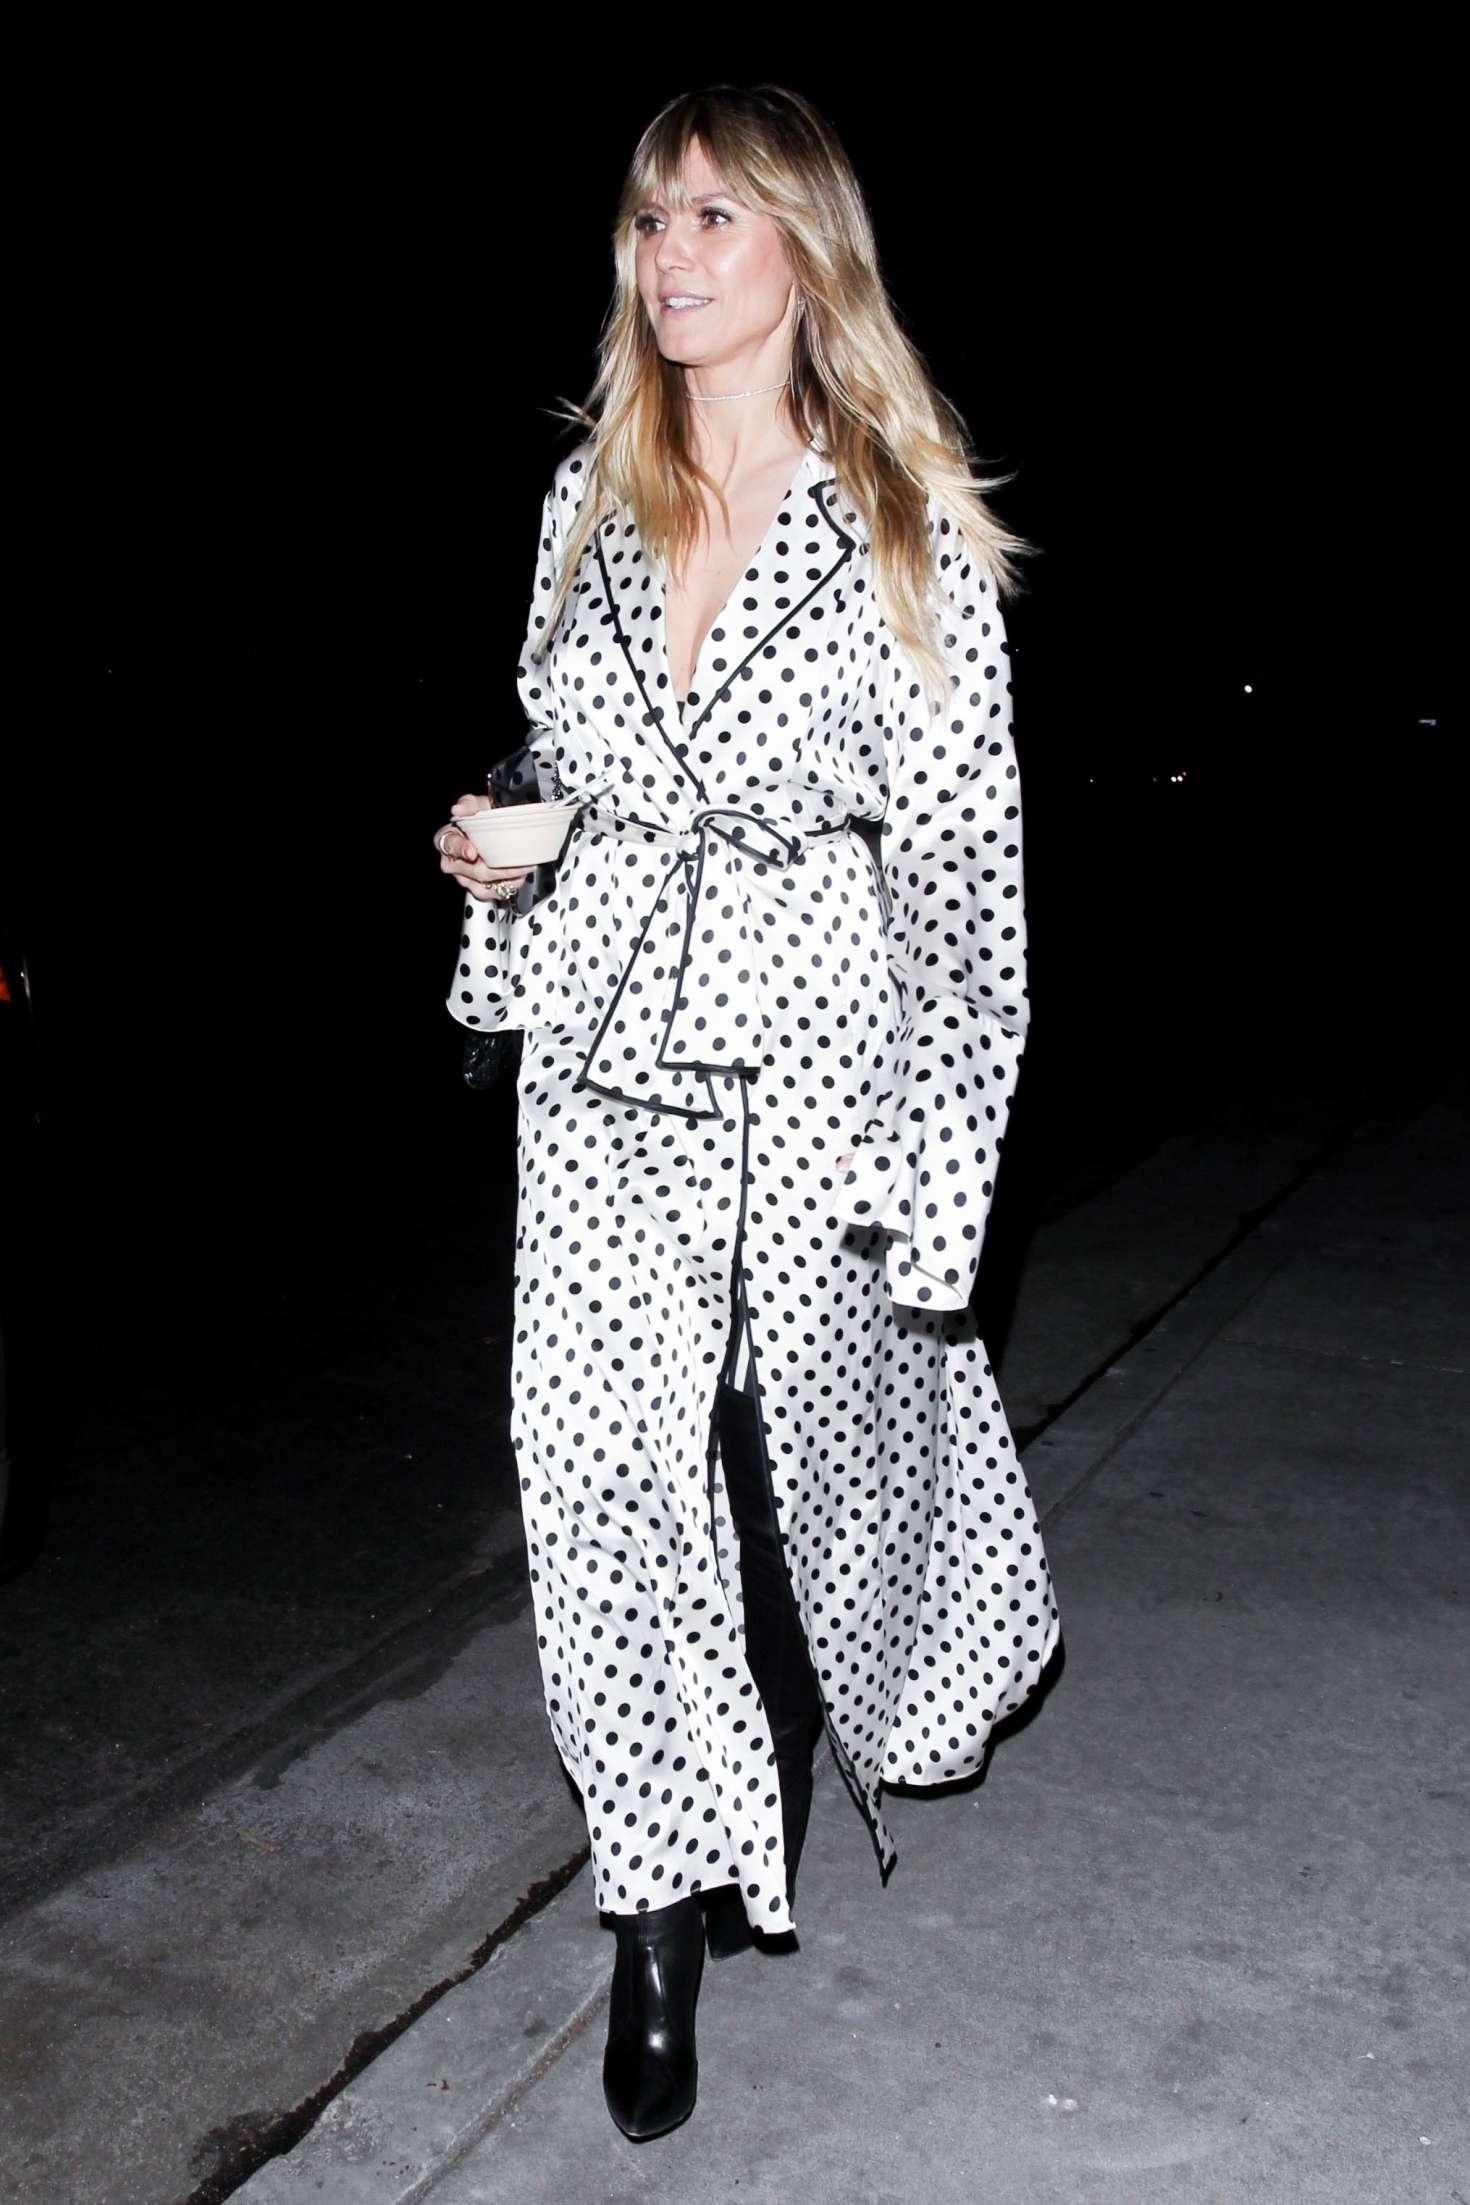 Heidi Klum 2019 : Heidi Klum: Leaves Billie Eilish Album Release Party -01